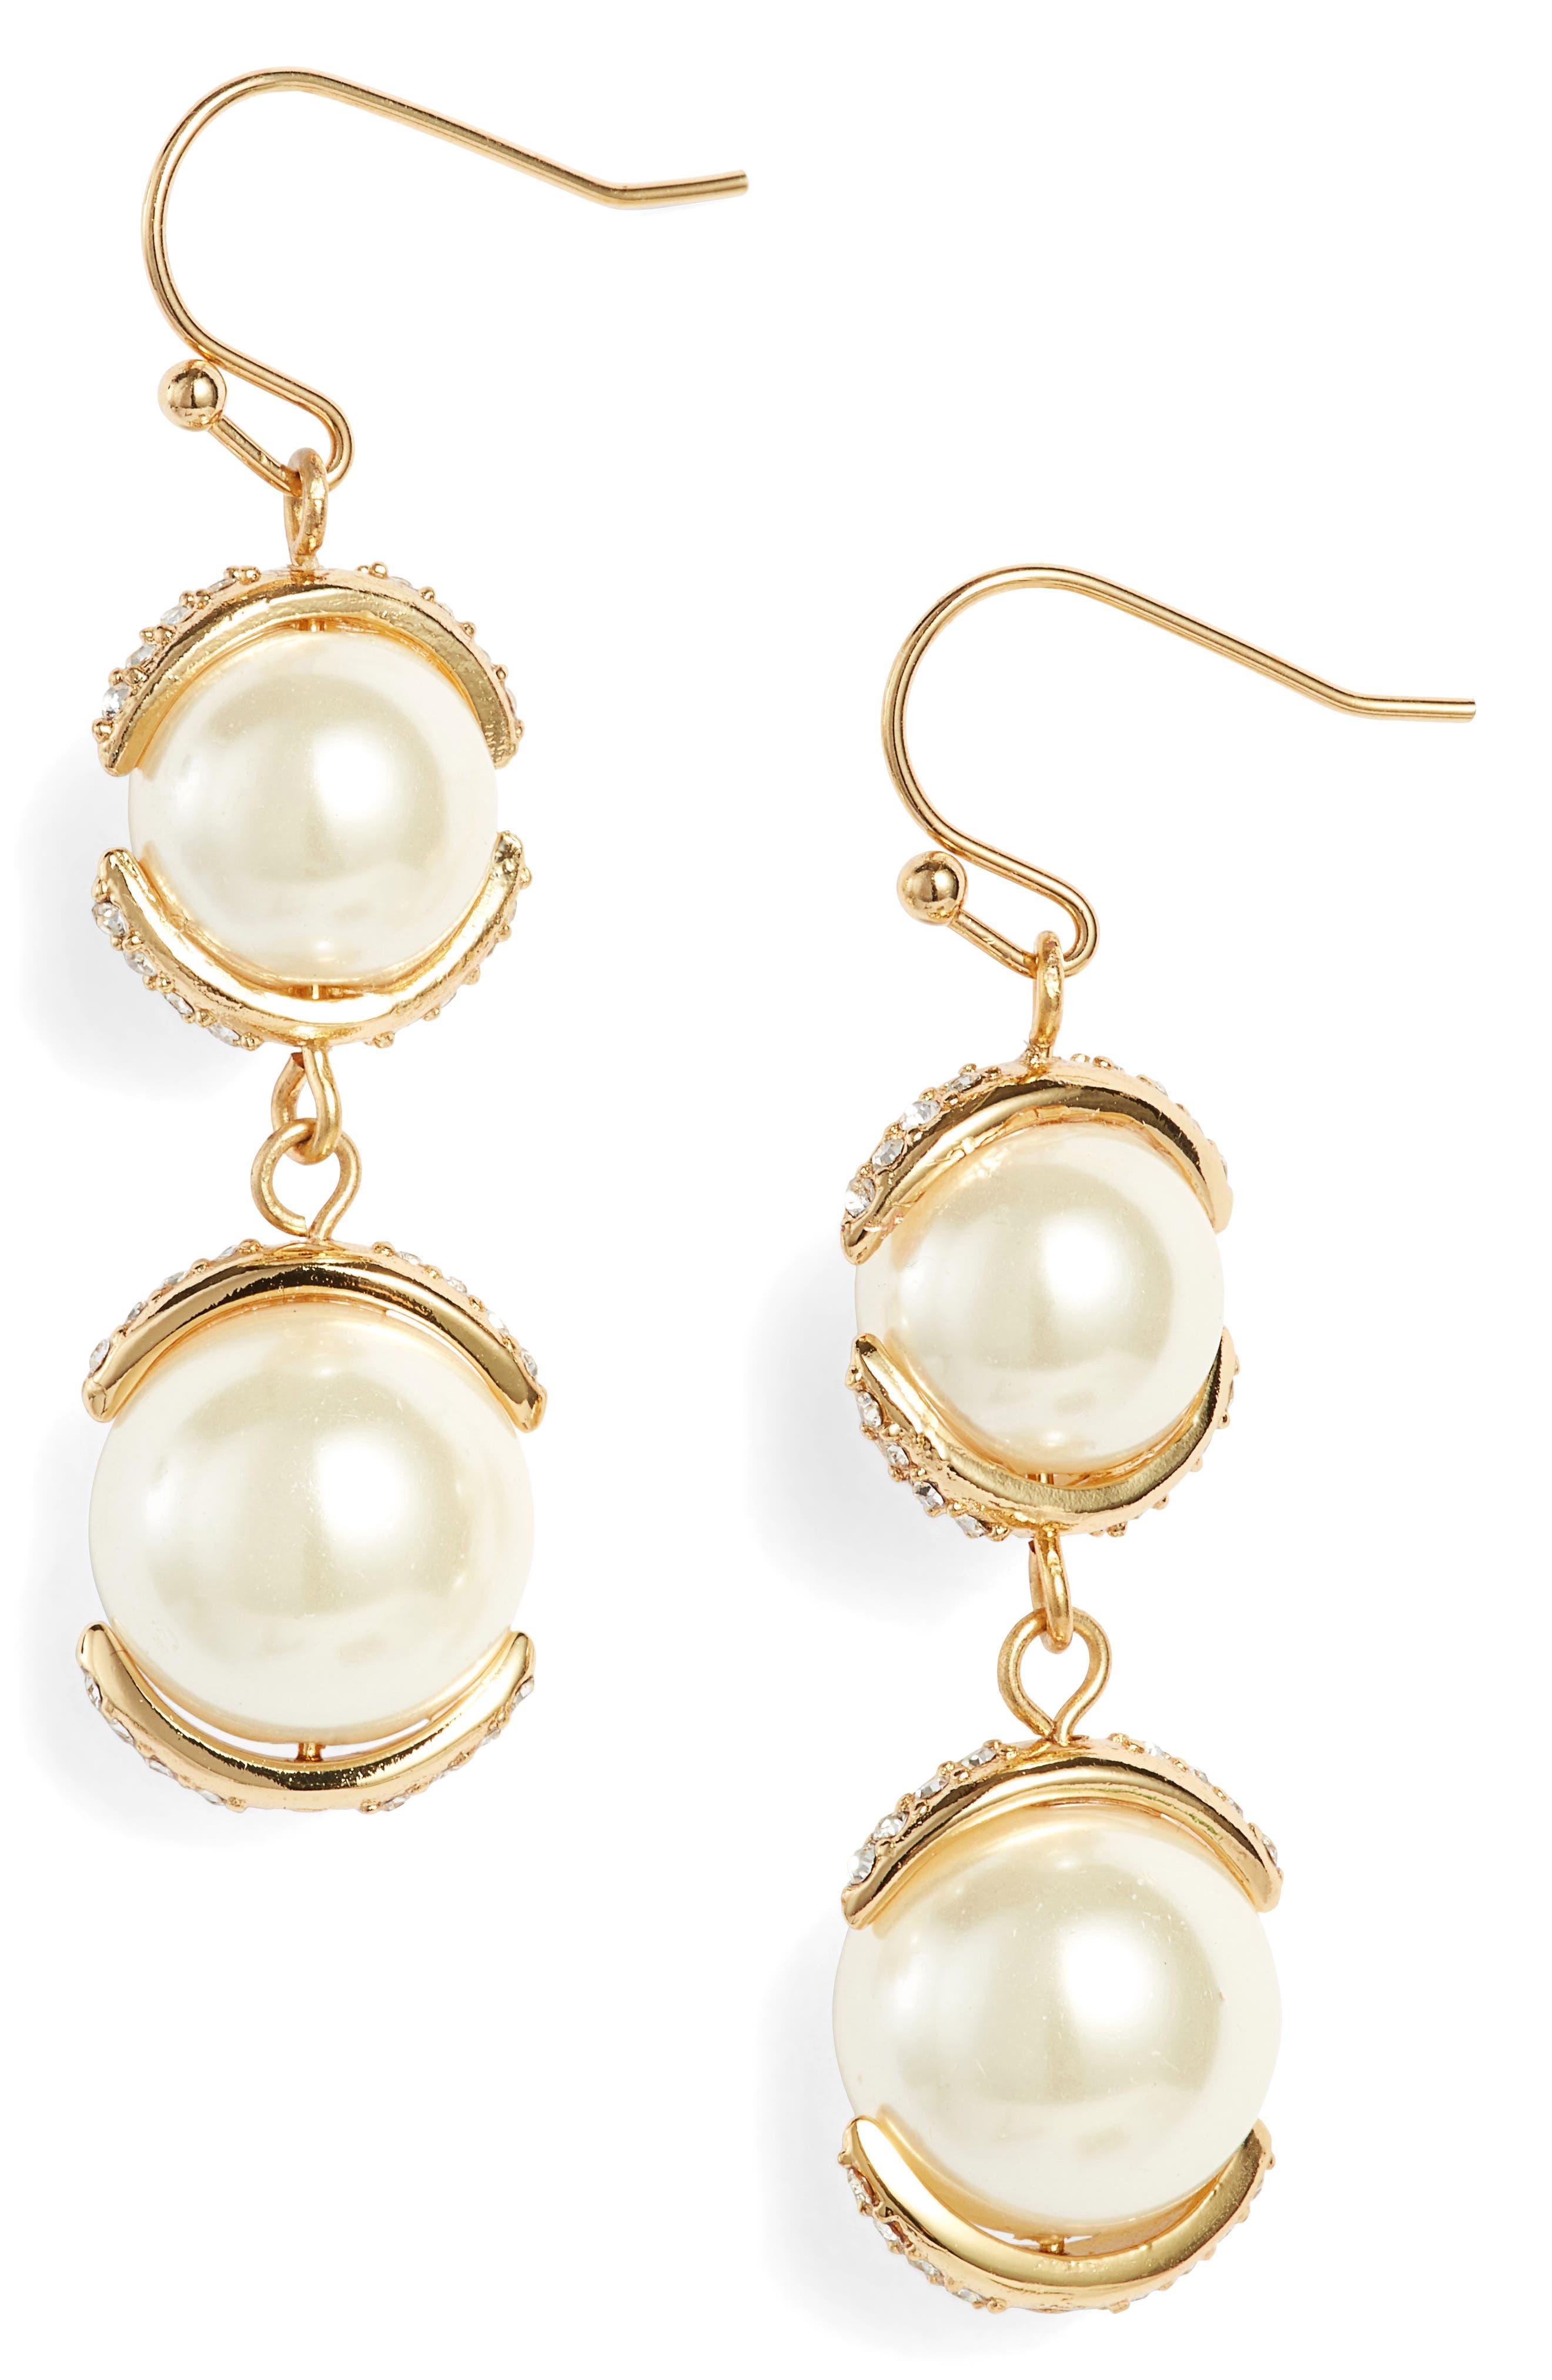 Imitation Pearl Drop Earrings,                             Main thumbnail 1, color,                             710